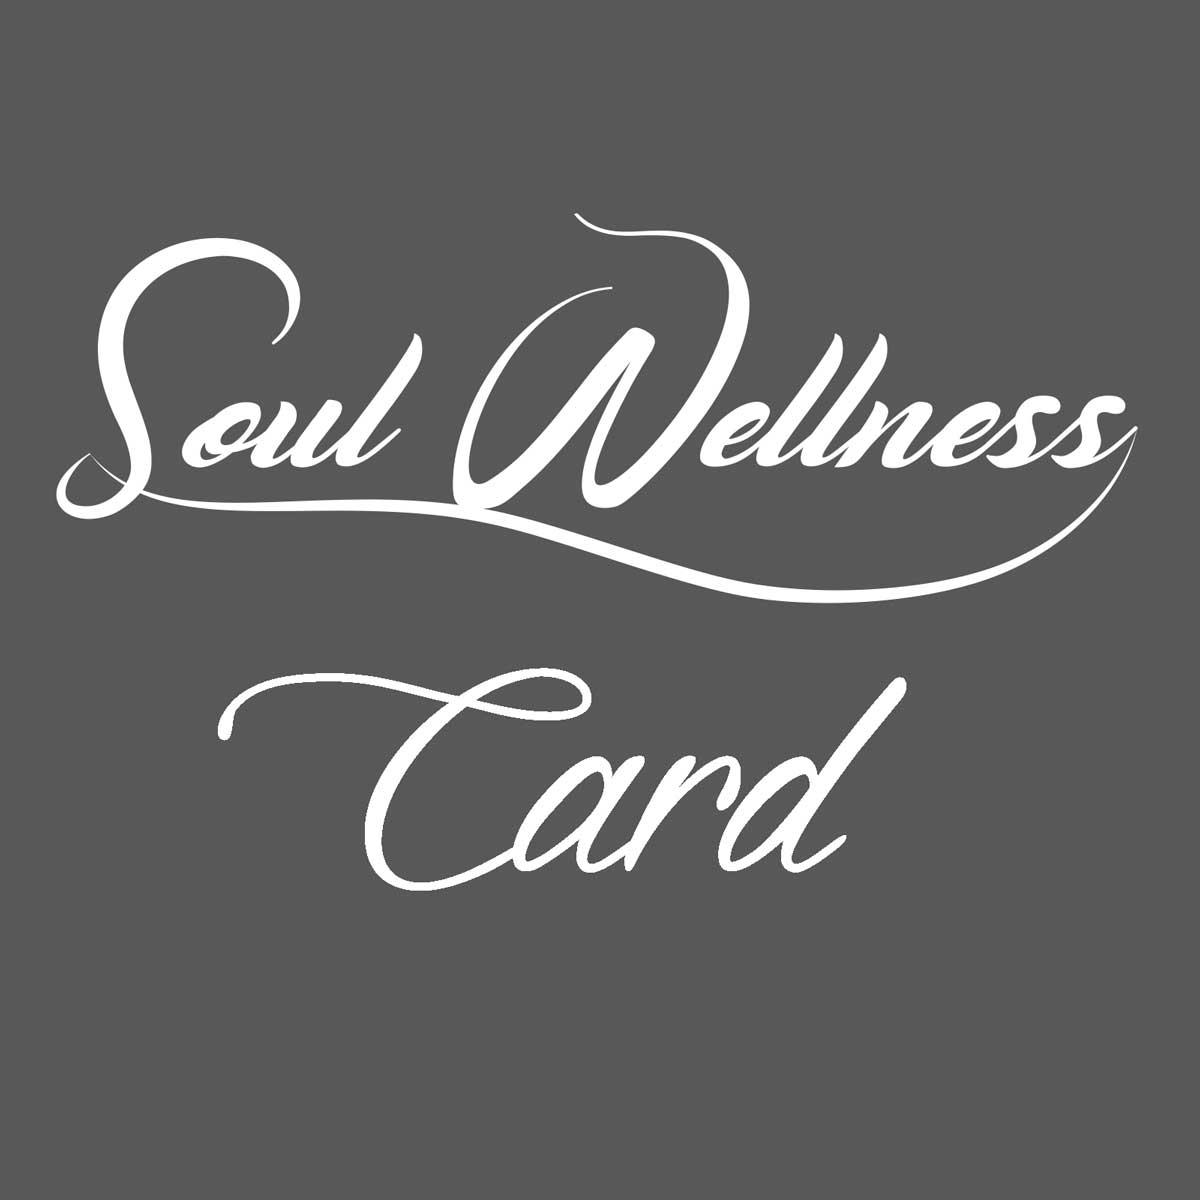 Soul Wellness Card: la libertà di scegliere